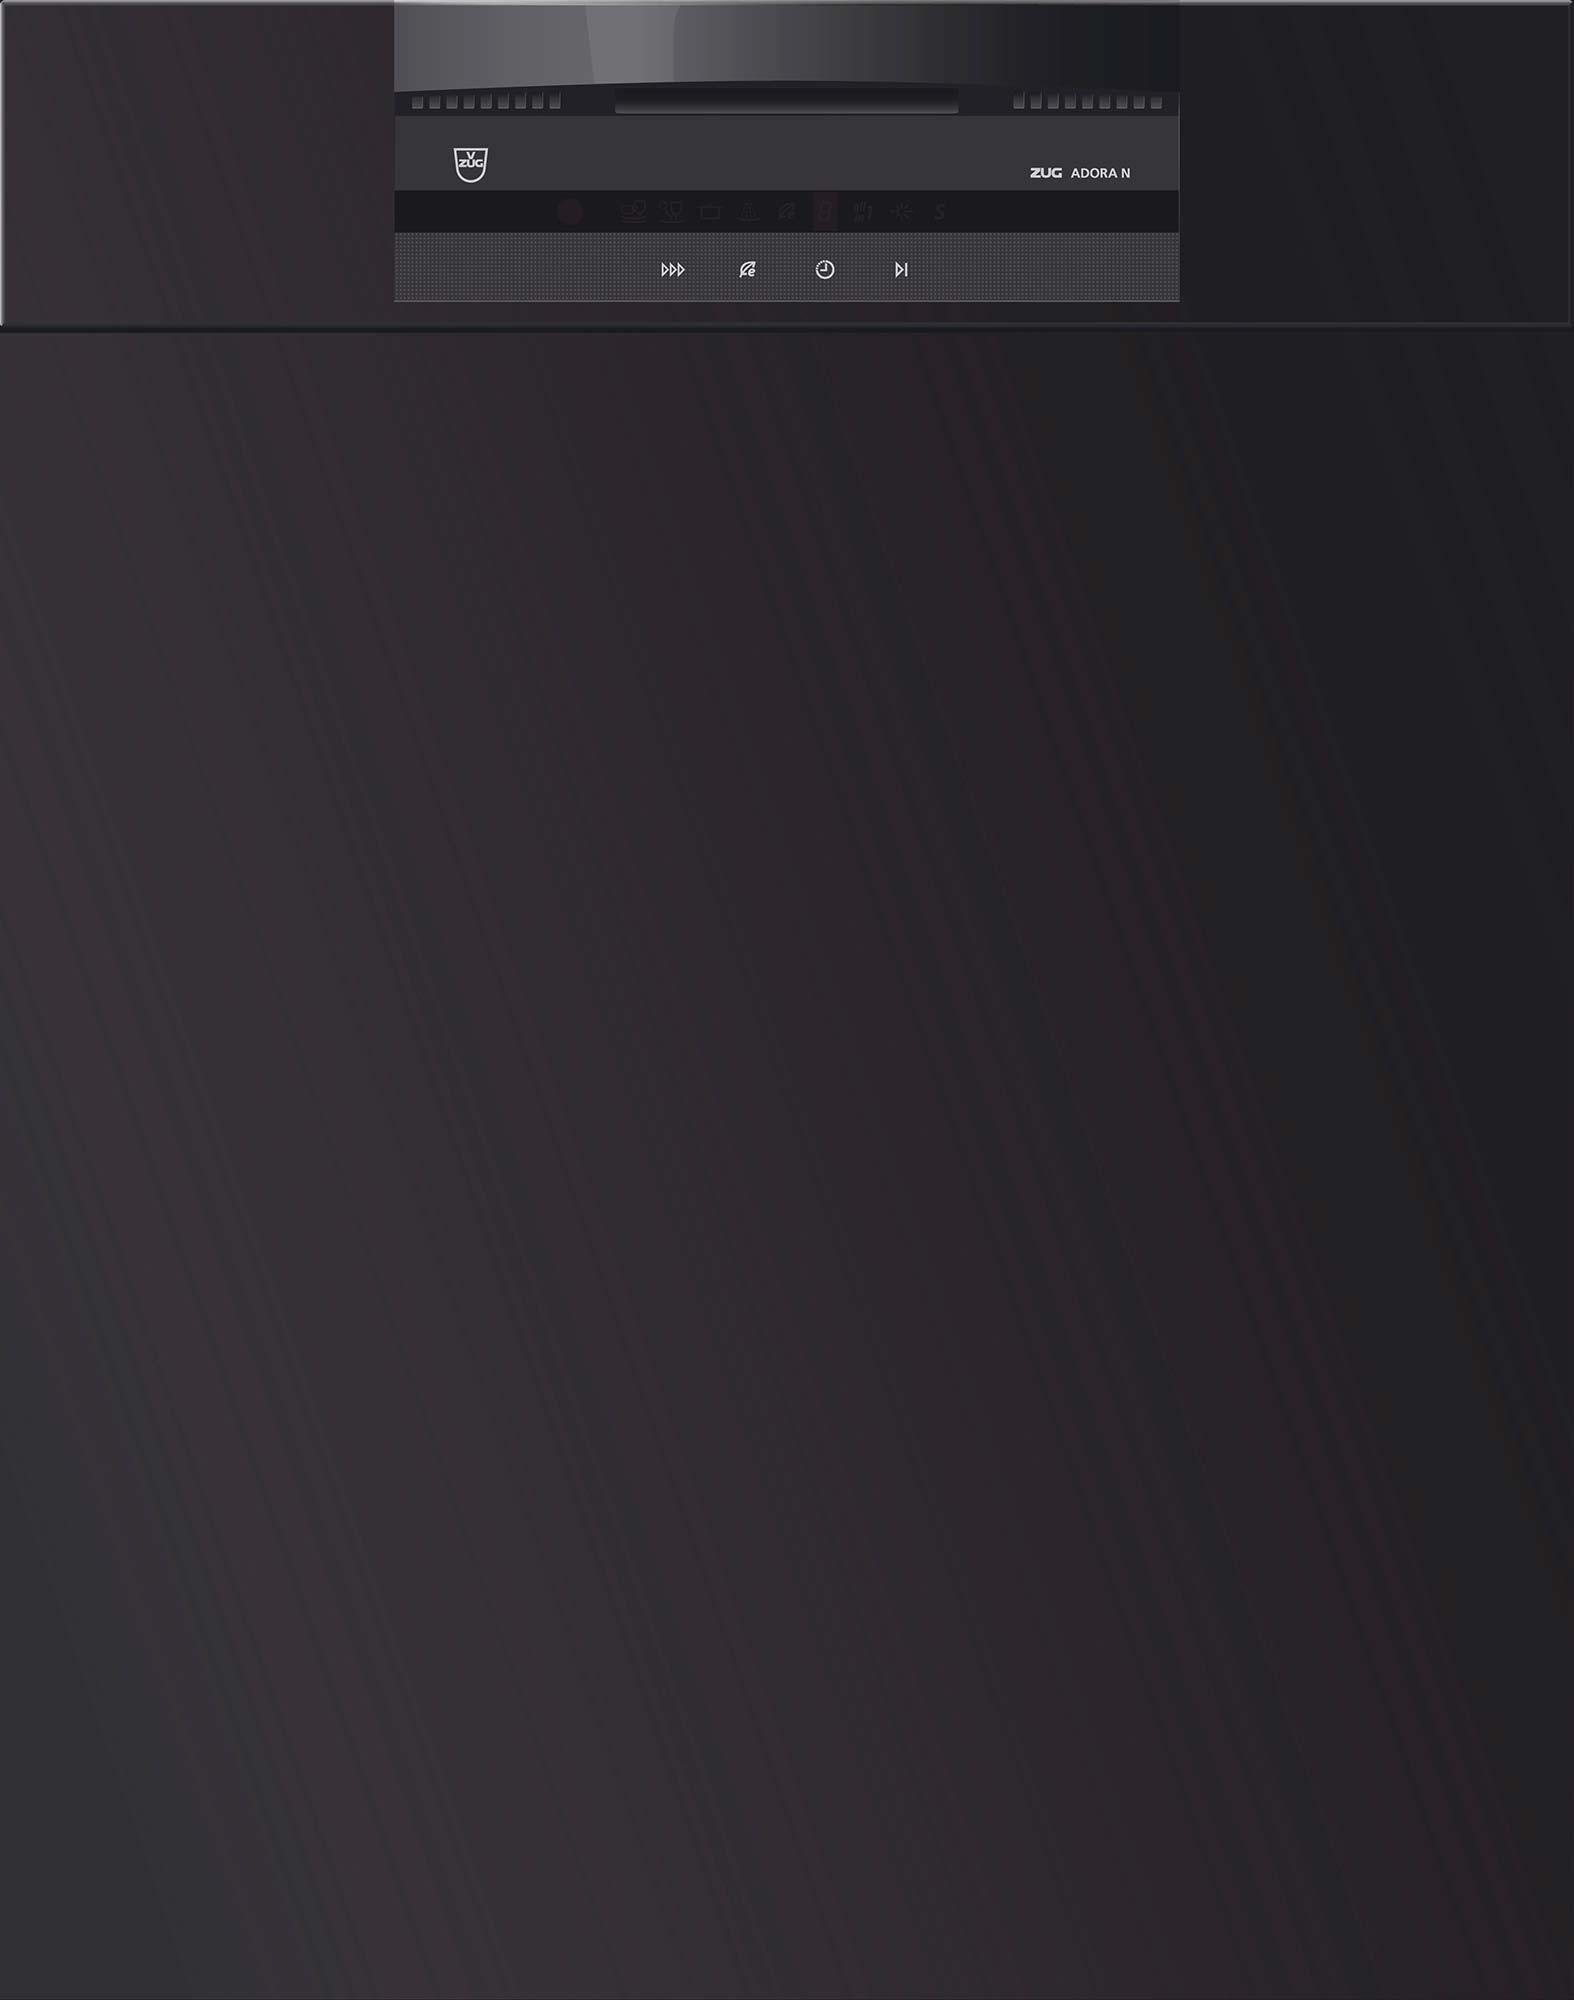 lave vaisselle zug norme suisse 55 cm adora 55 ni noir. Black Bedroom Furniture Sets. Home Design Ideas